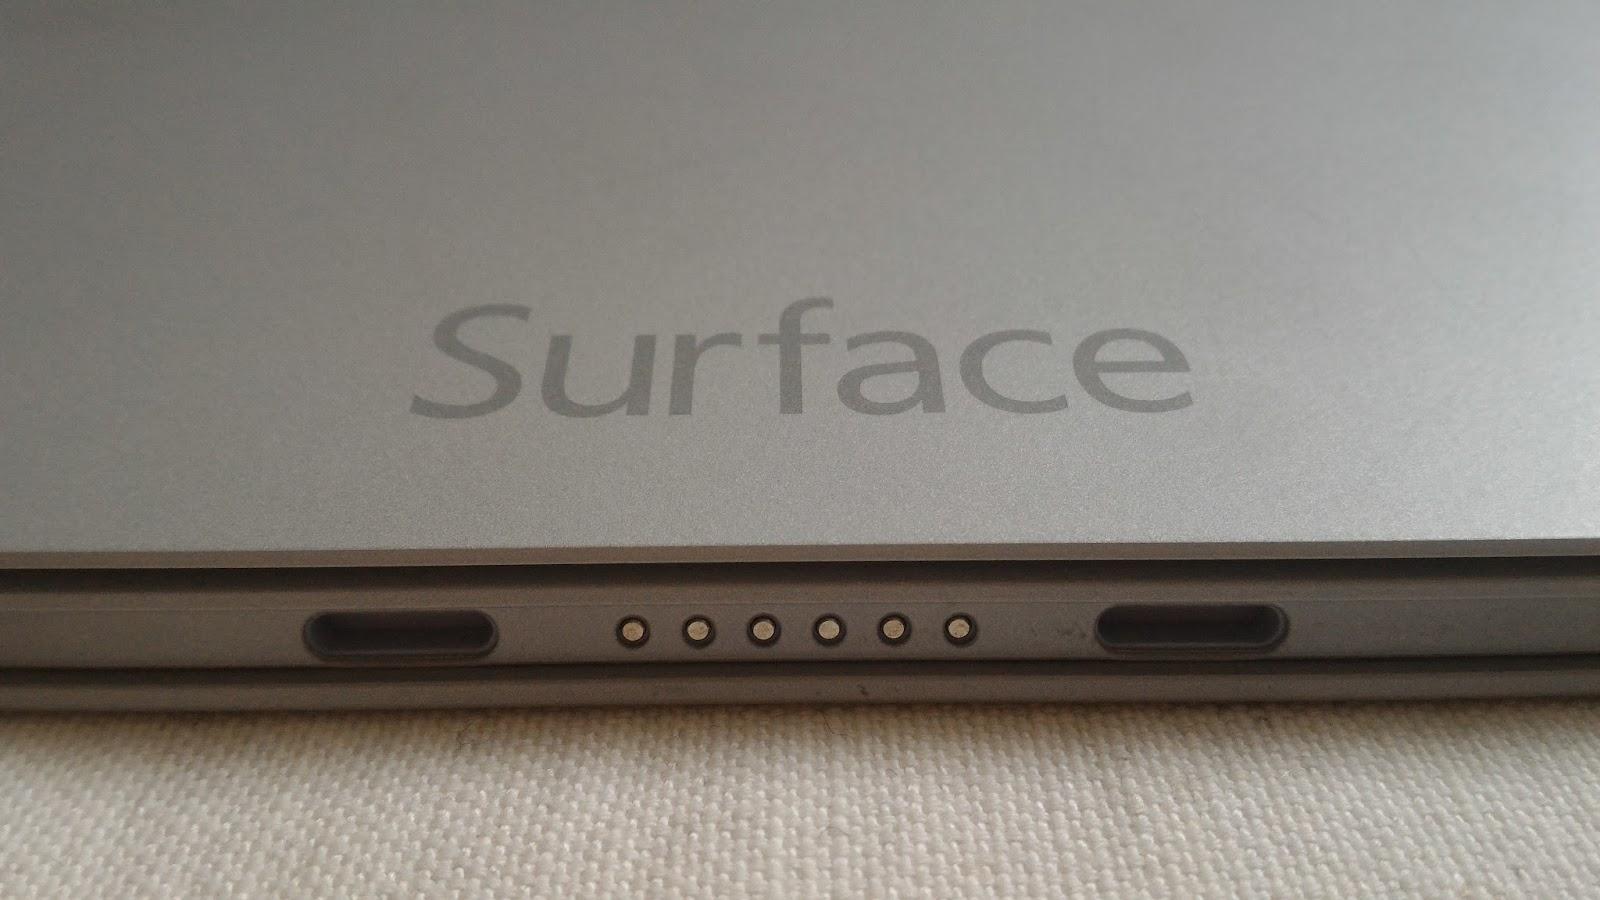 P 20170122 162527 - [開箱] 效能輕薄兼具.Surface Pro 3 (i3/64G) 使用心得!